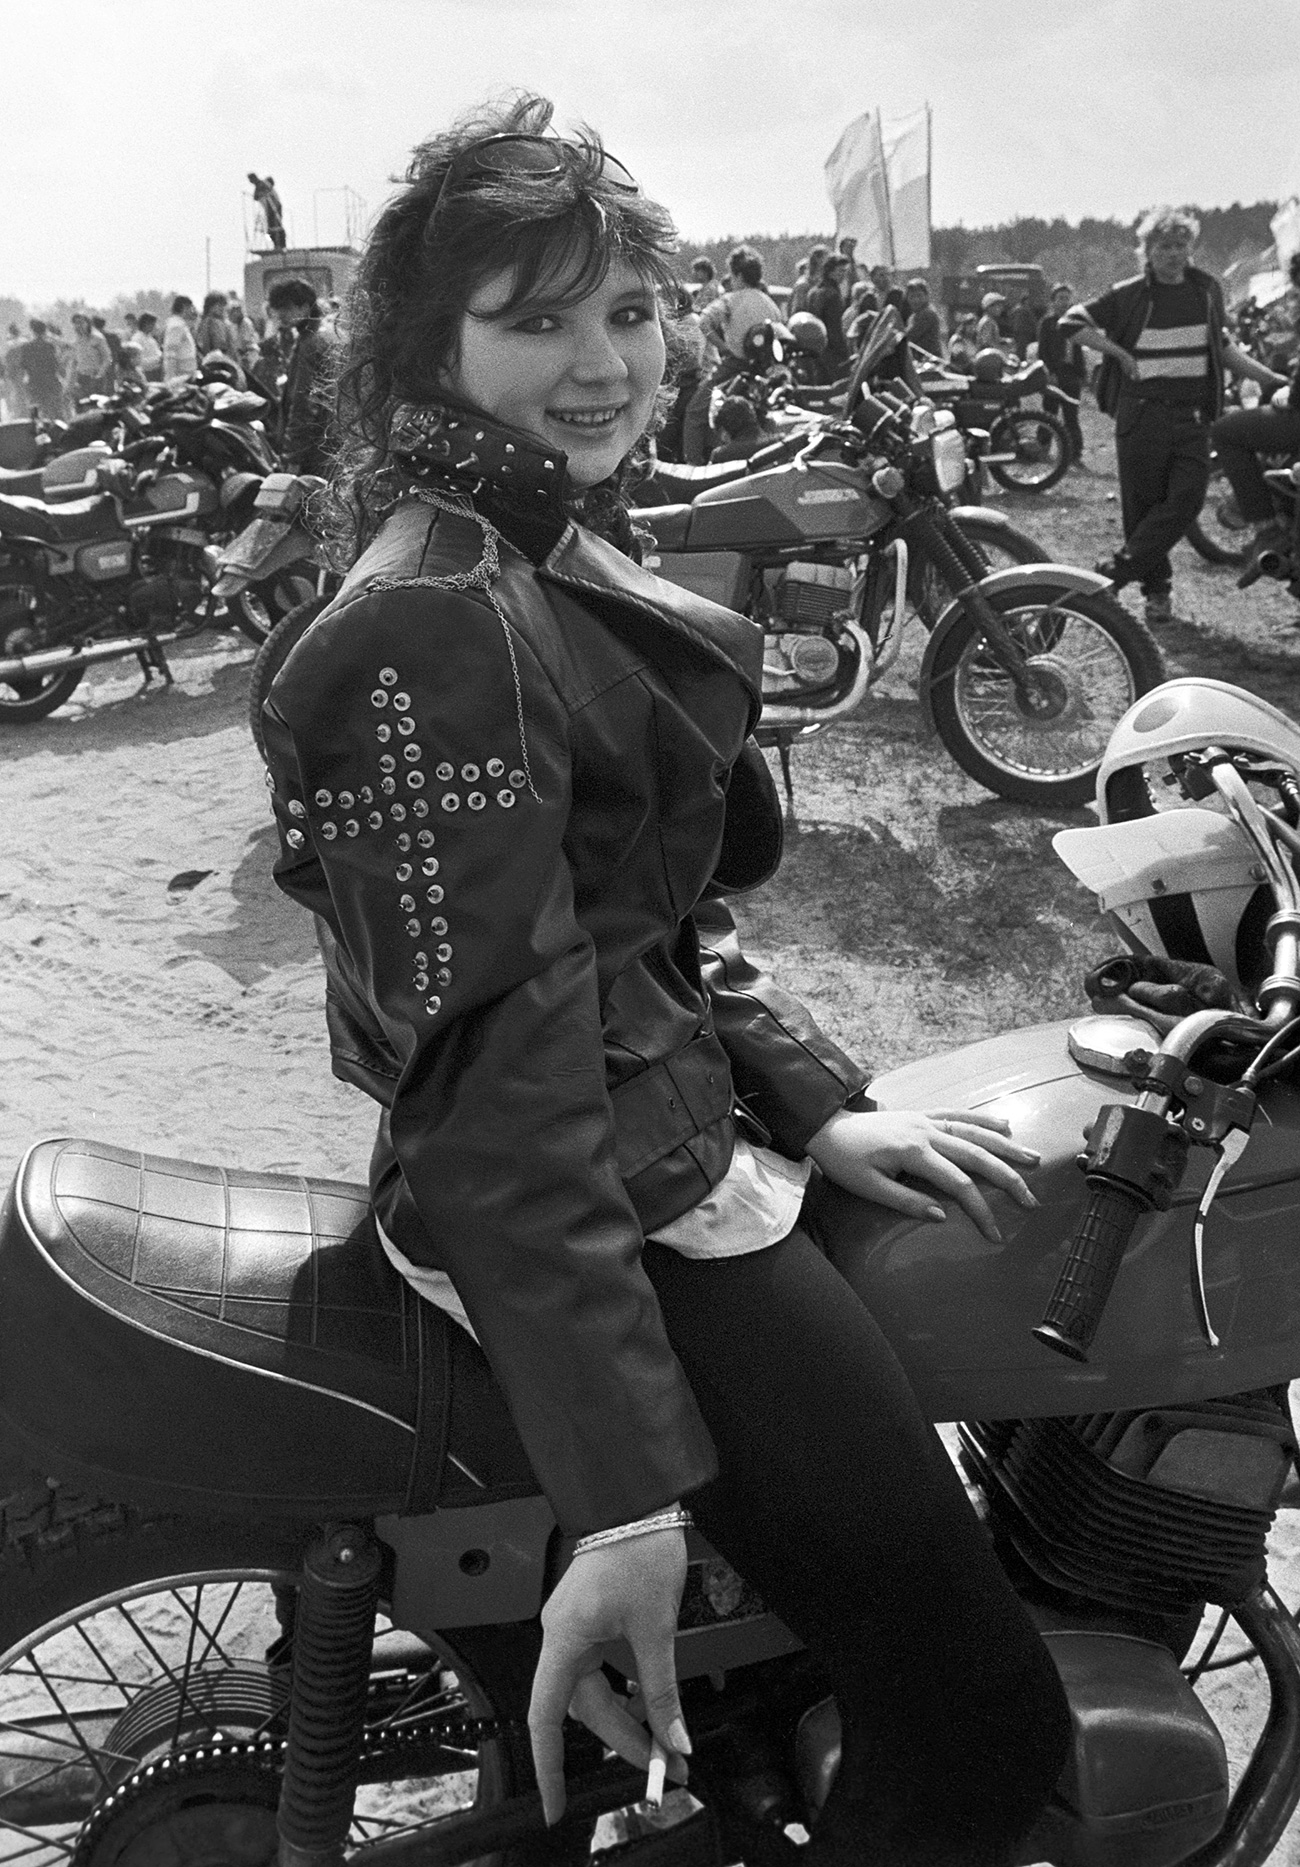 A female biker sitting on a motorcycle. / Oleg Porokhovniko/TASS